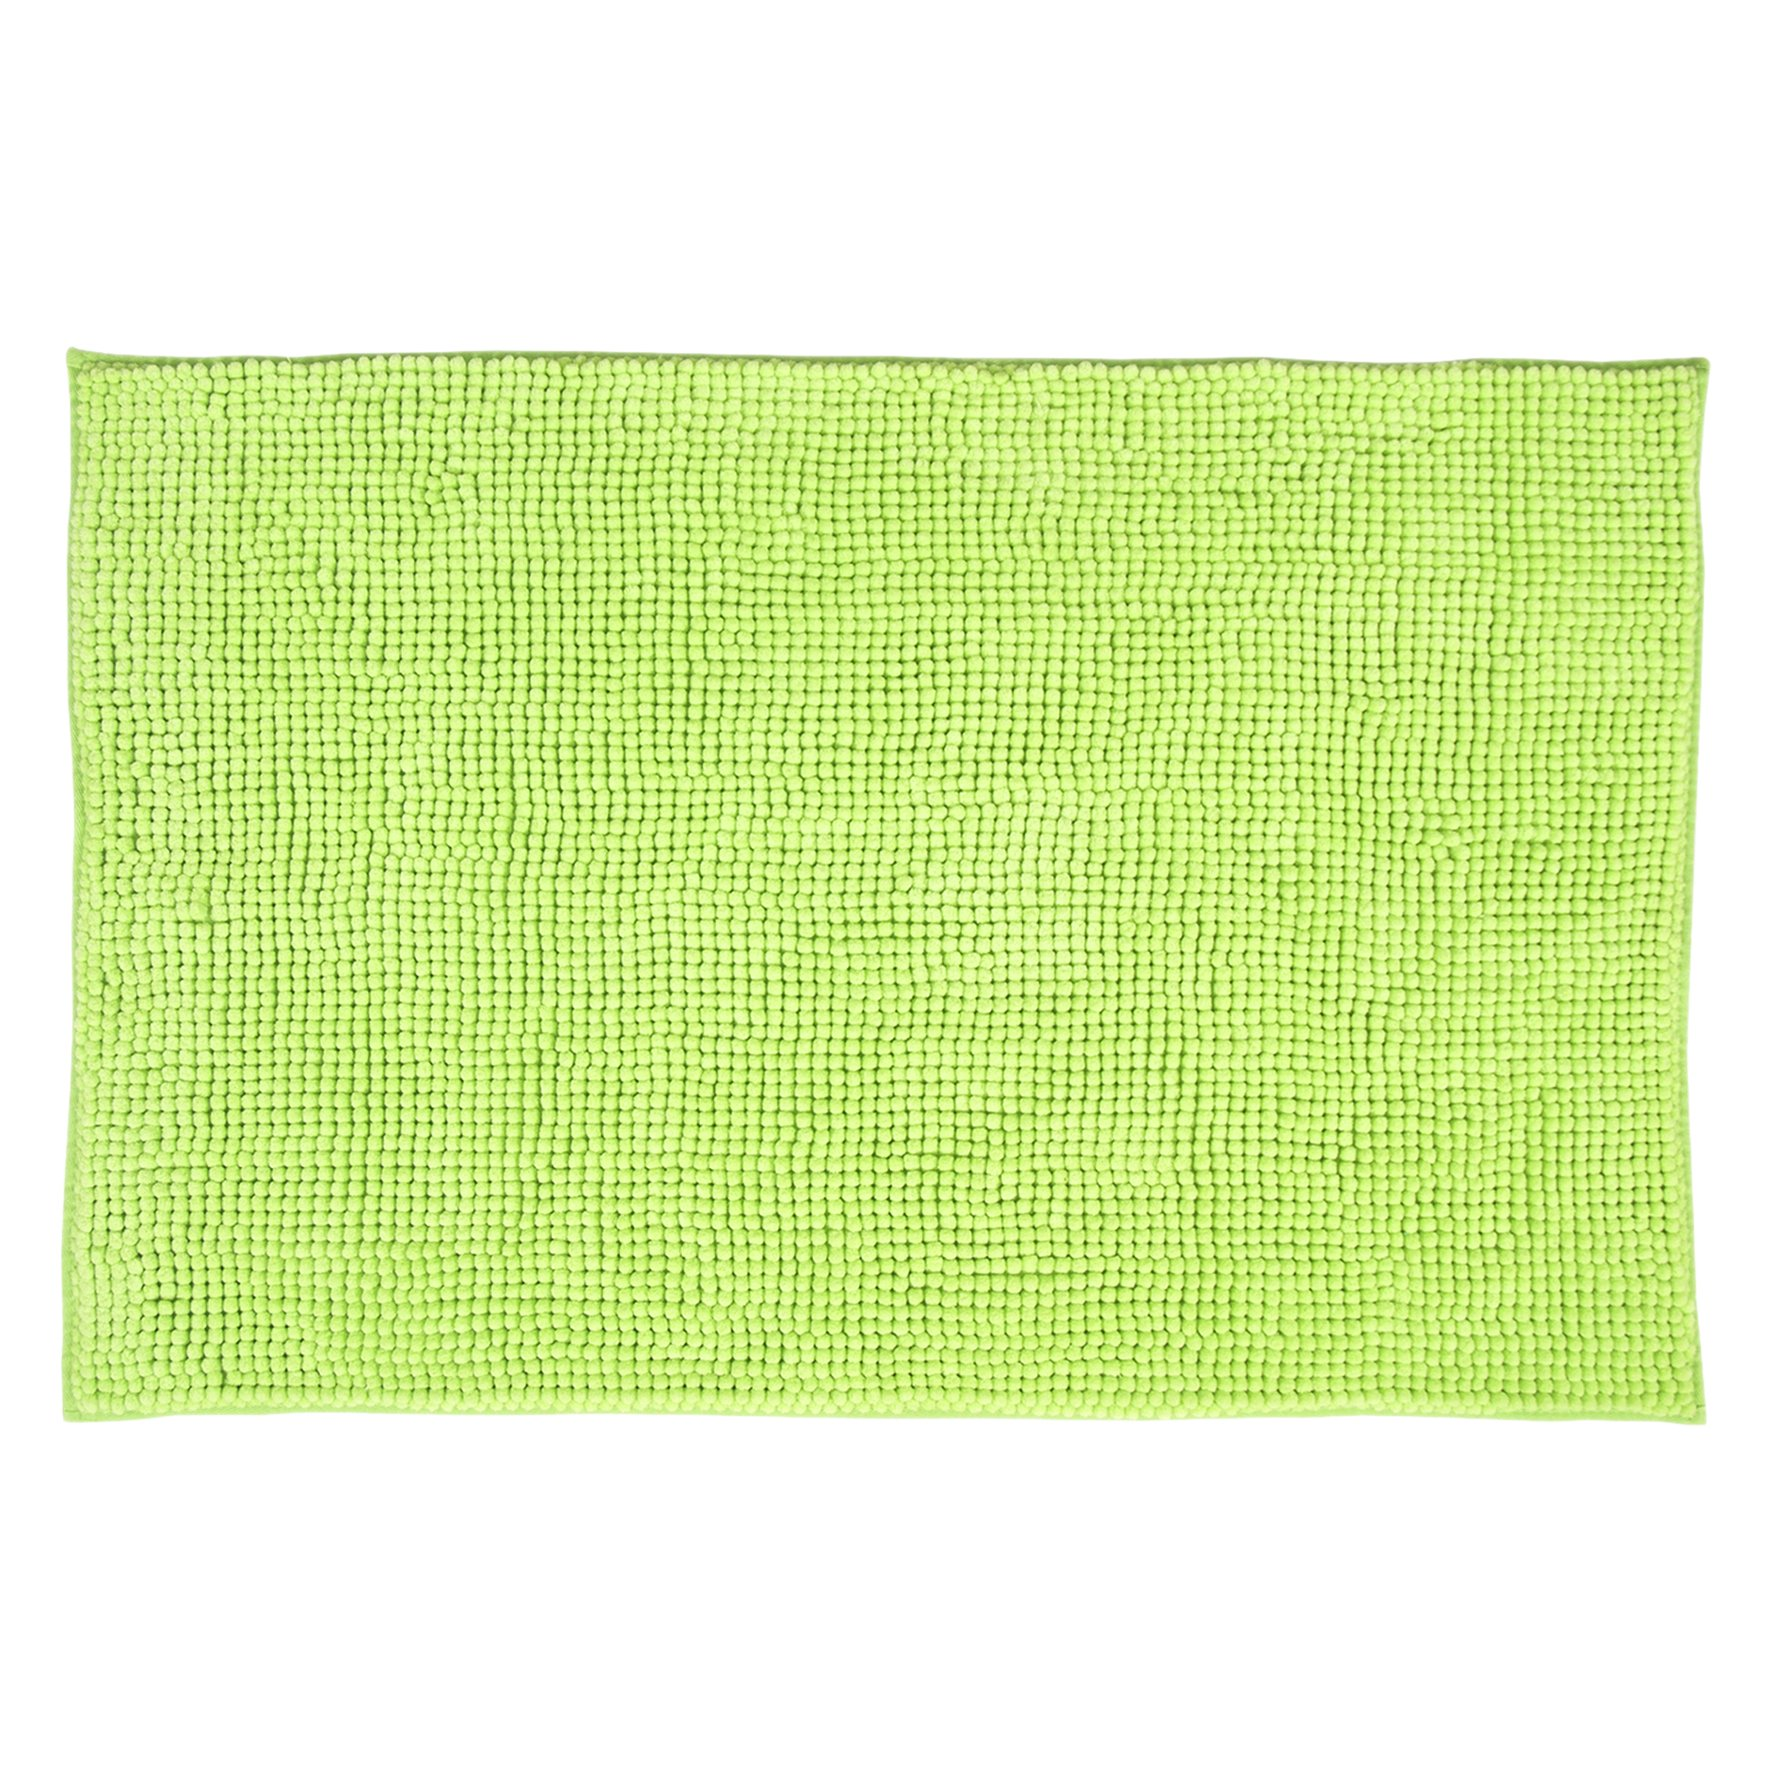 DIFFERNZ 31.102.90Candore Bath Mat, Lime Green/Matching Colour by Differnz